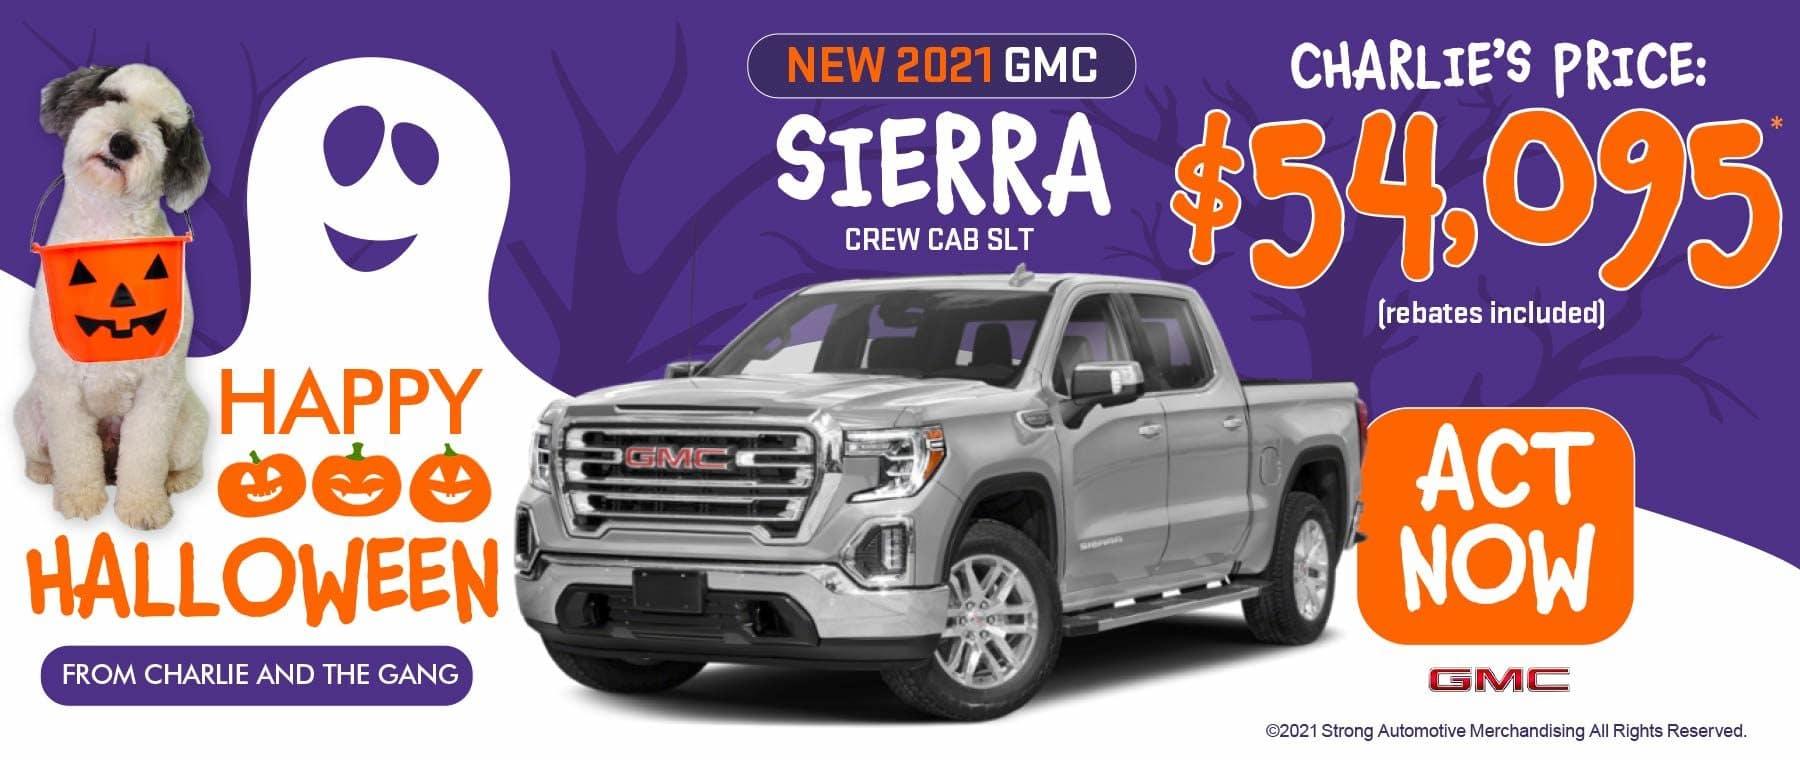 NEW 2021 GMC SIERRA CREW CAB SLT MSRP: $56,095, SALE PRICE: $54,095 Stk#2693 ACT NOW